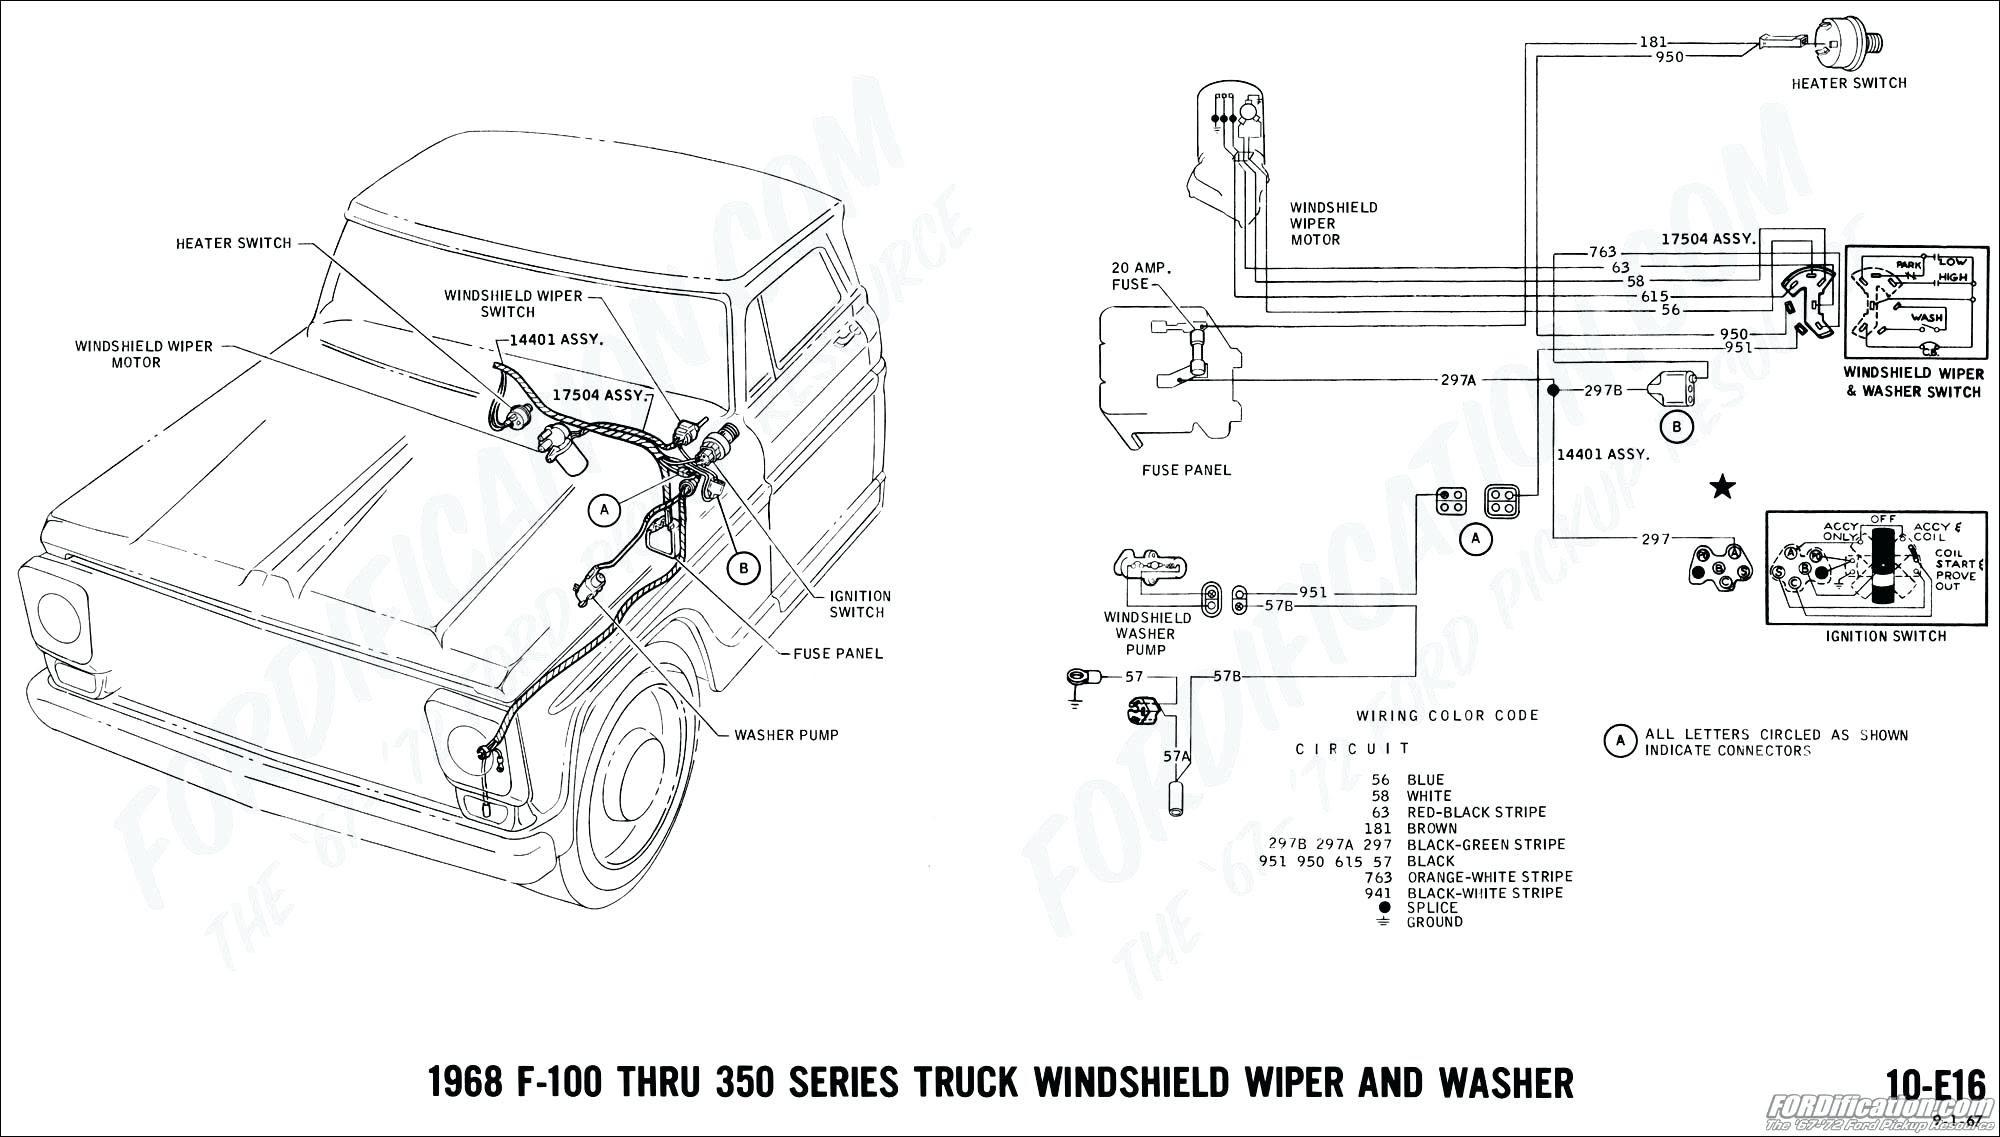 1984 Toyota 22r Fuse Box Diagram 2006 F250 Reverse Light Wiring Diagram Color Code Cummis Nescafe Jeanjaures37 Fr